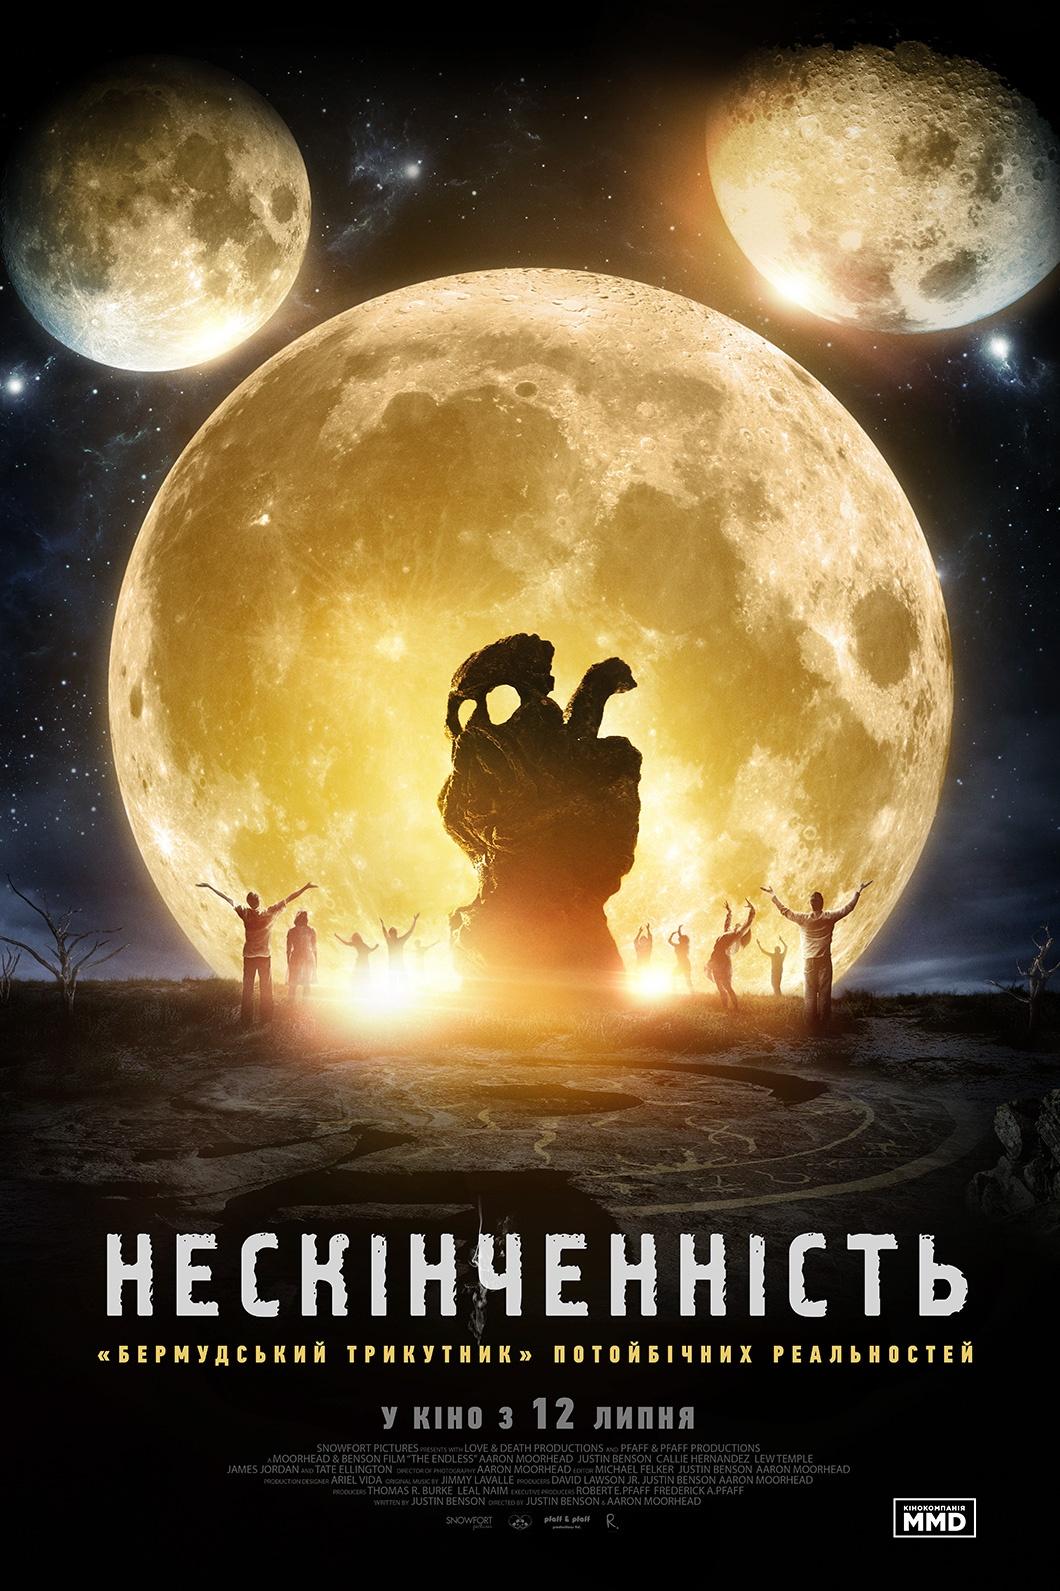 v-ukraine-startuet-pokaz-misticheskogo-trillera-beskonechnost-3